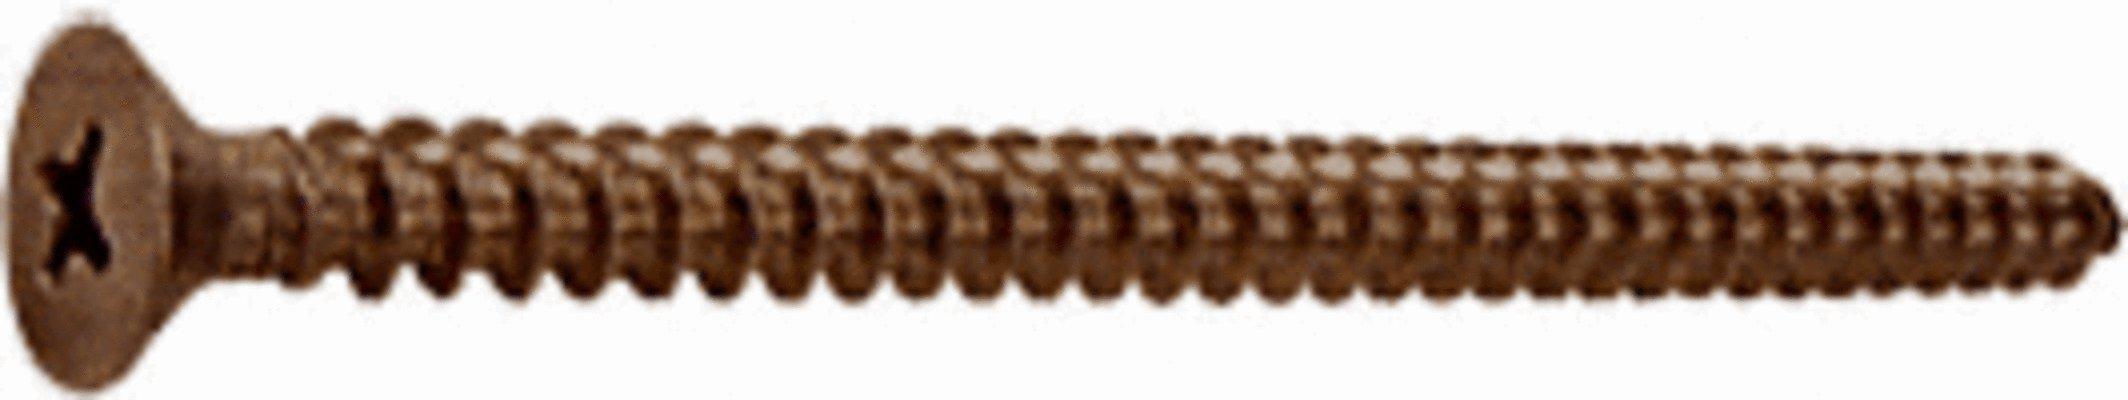 CRL Antique Bronze #10 x 3'' Wall Mounting Flat Head Phillips Sheet Metal Screw - Package